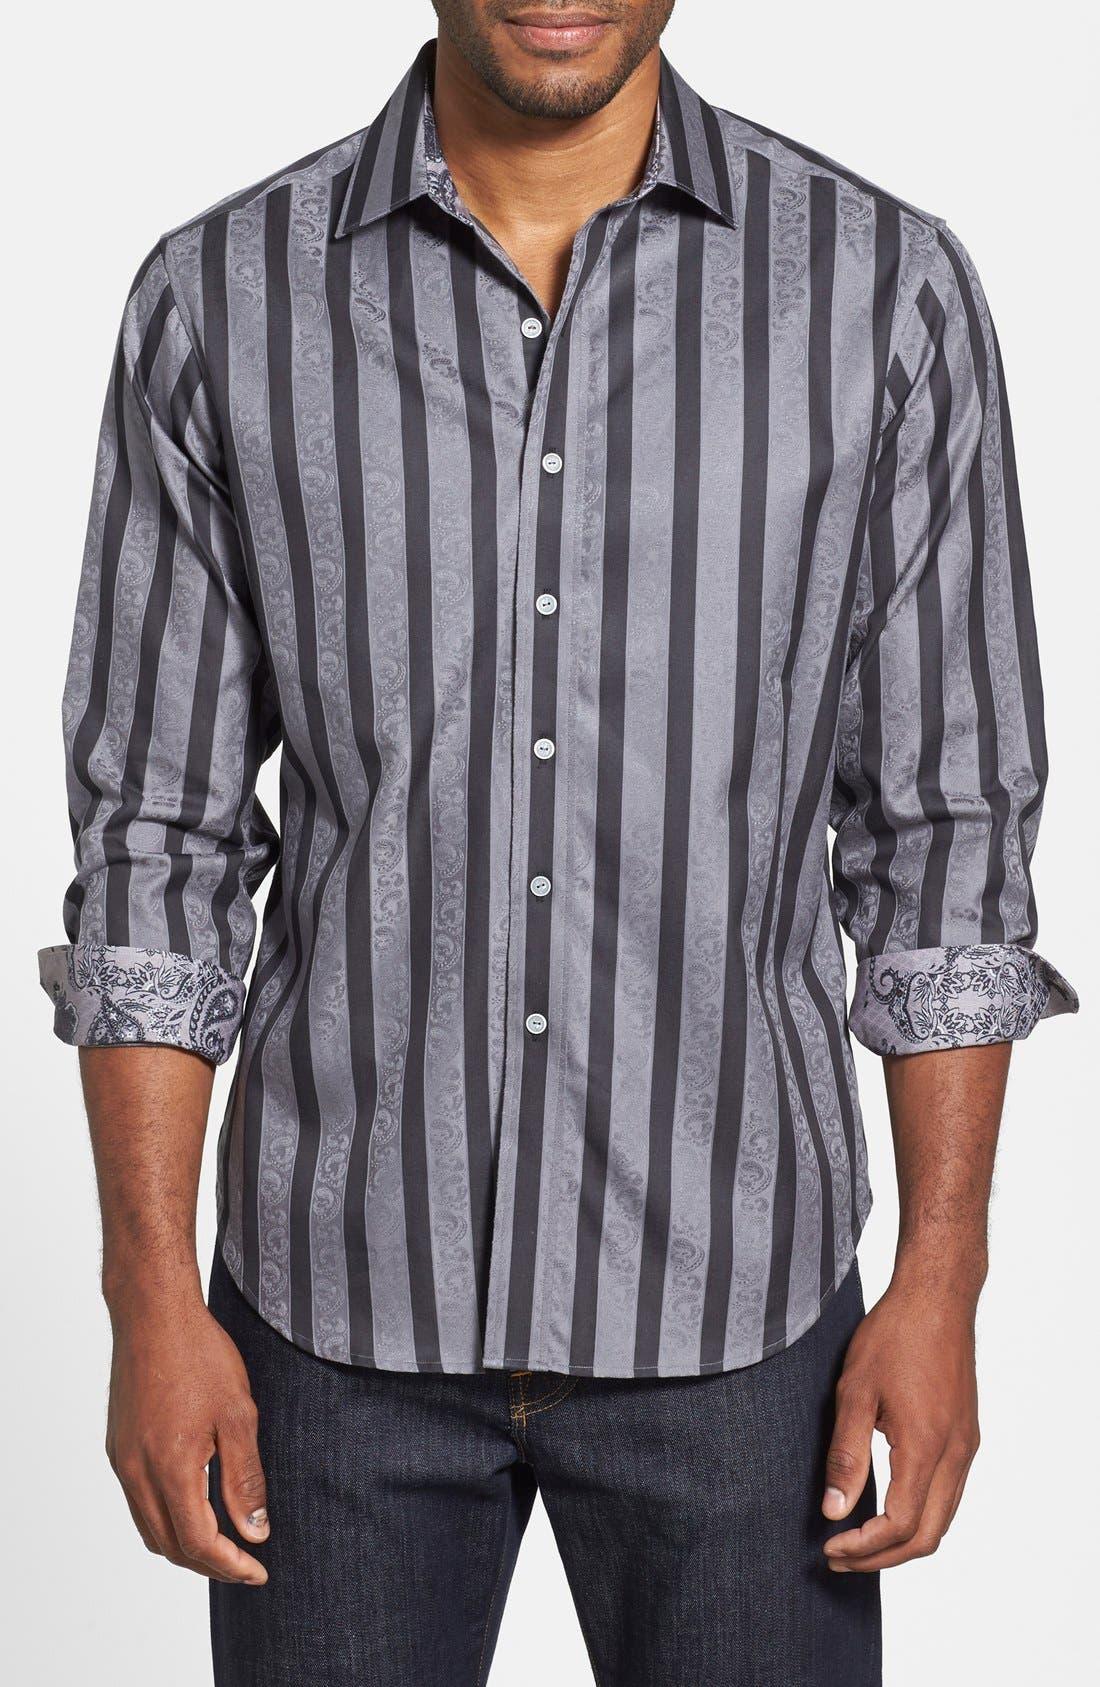 Main Image - Robert Graham 'Shawn' Classic Fit Paisley Jacquard Sport Shirt